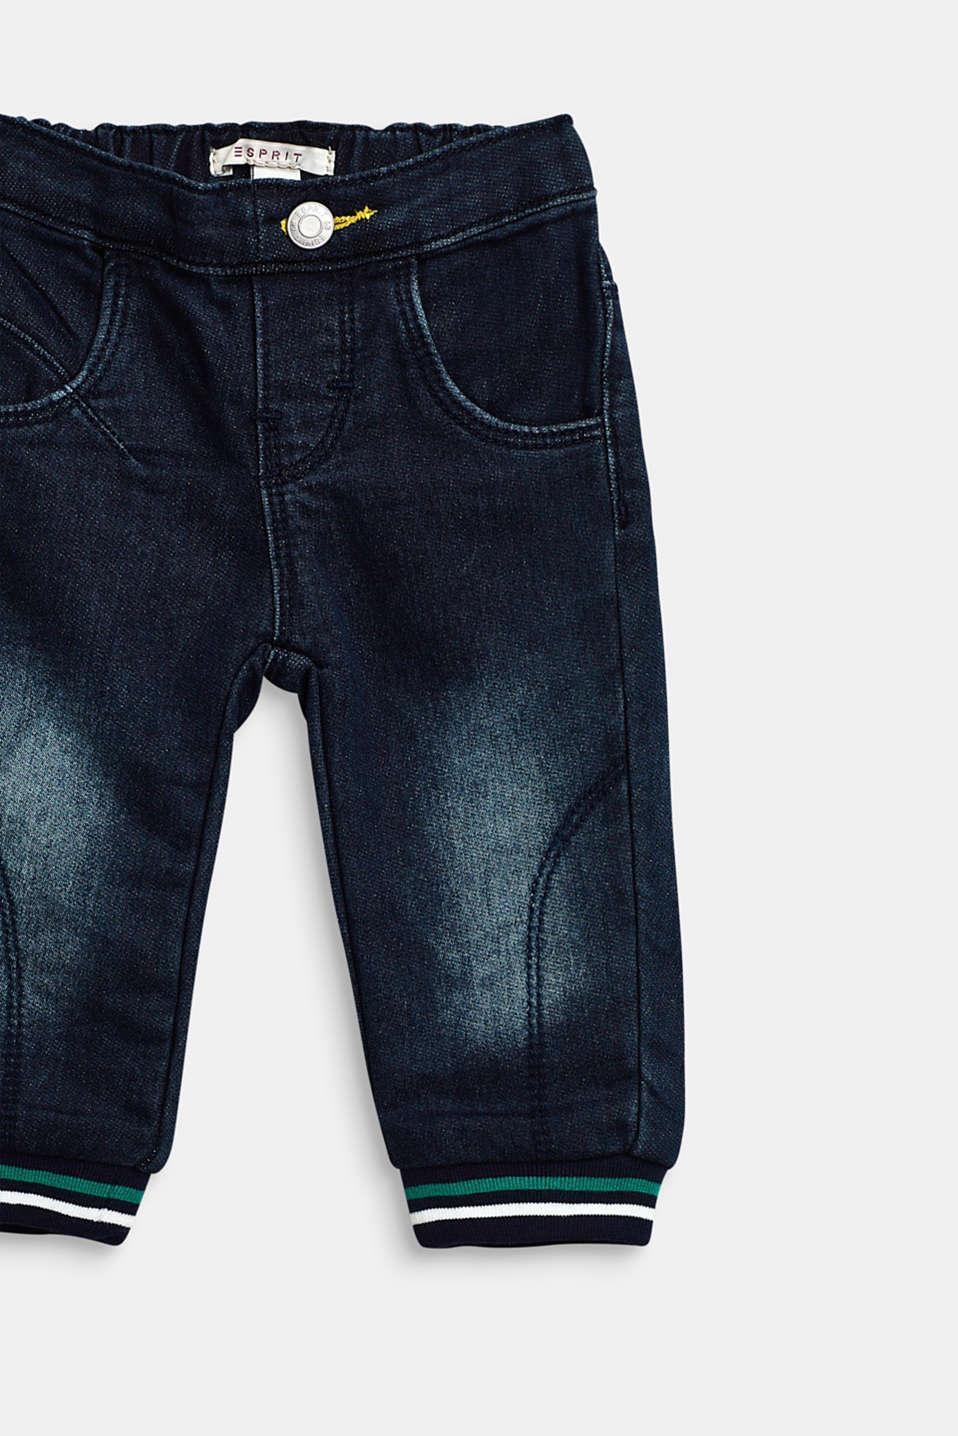 Tracksuit jeans with striped trims, LCDARK INDIGO DE, detail image number 2